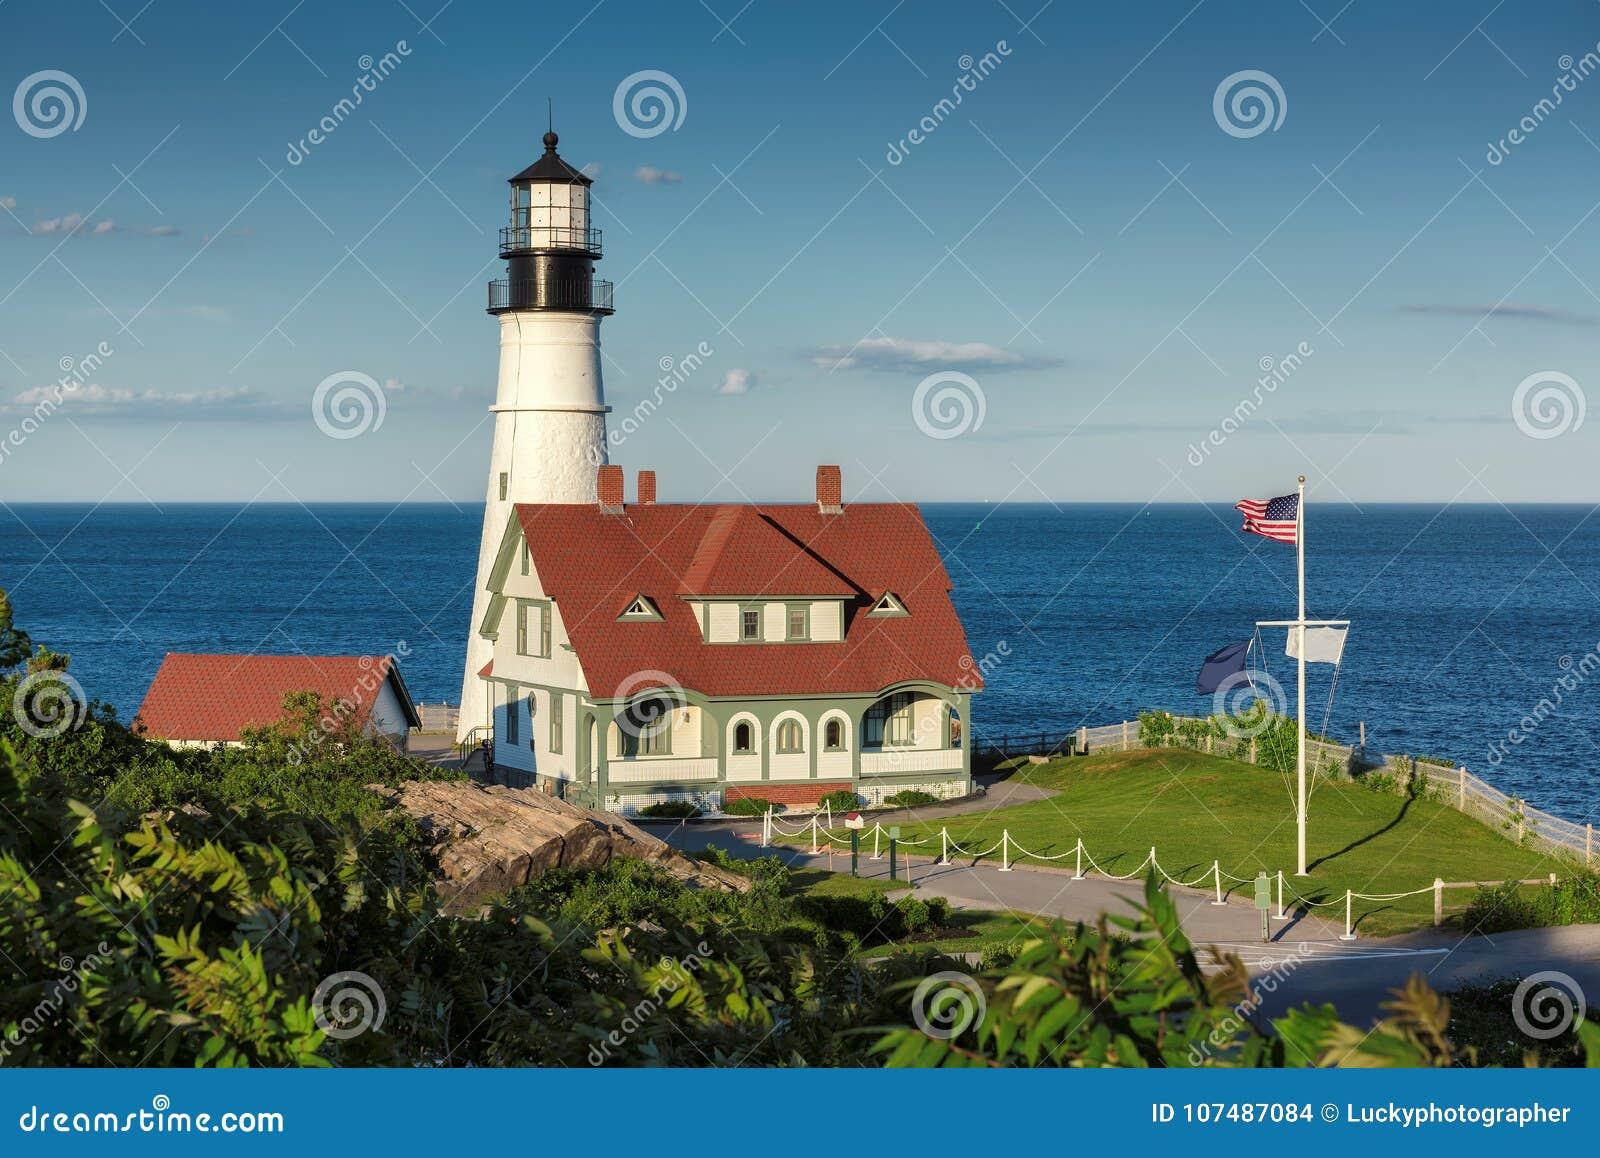 Portland Head Light at sunset in Cape Elizabeth, Maine, USA.